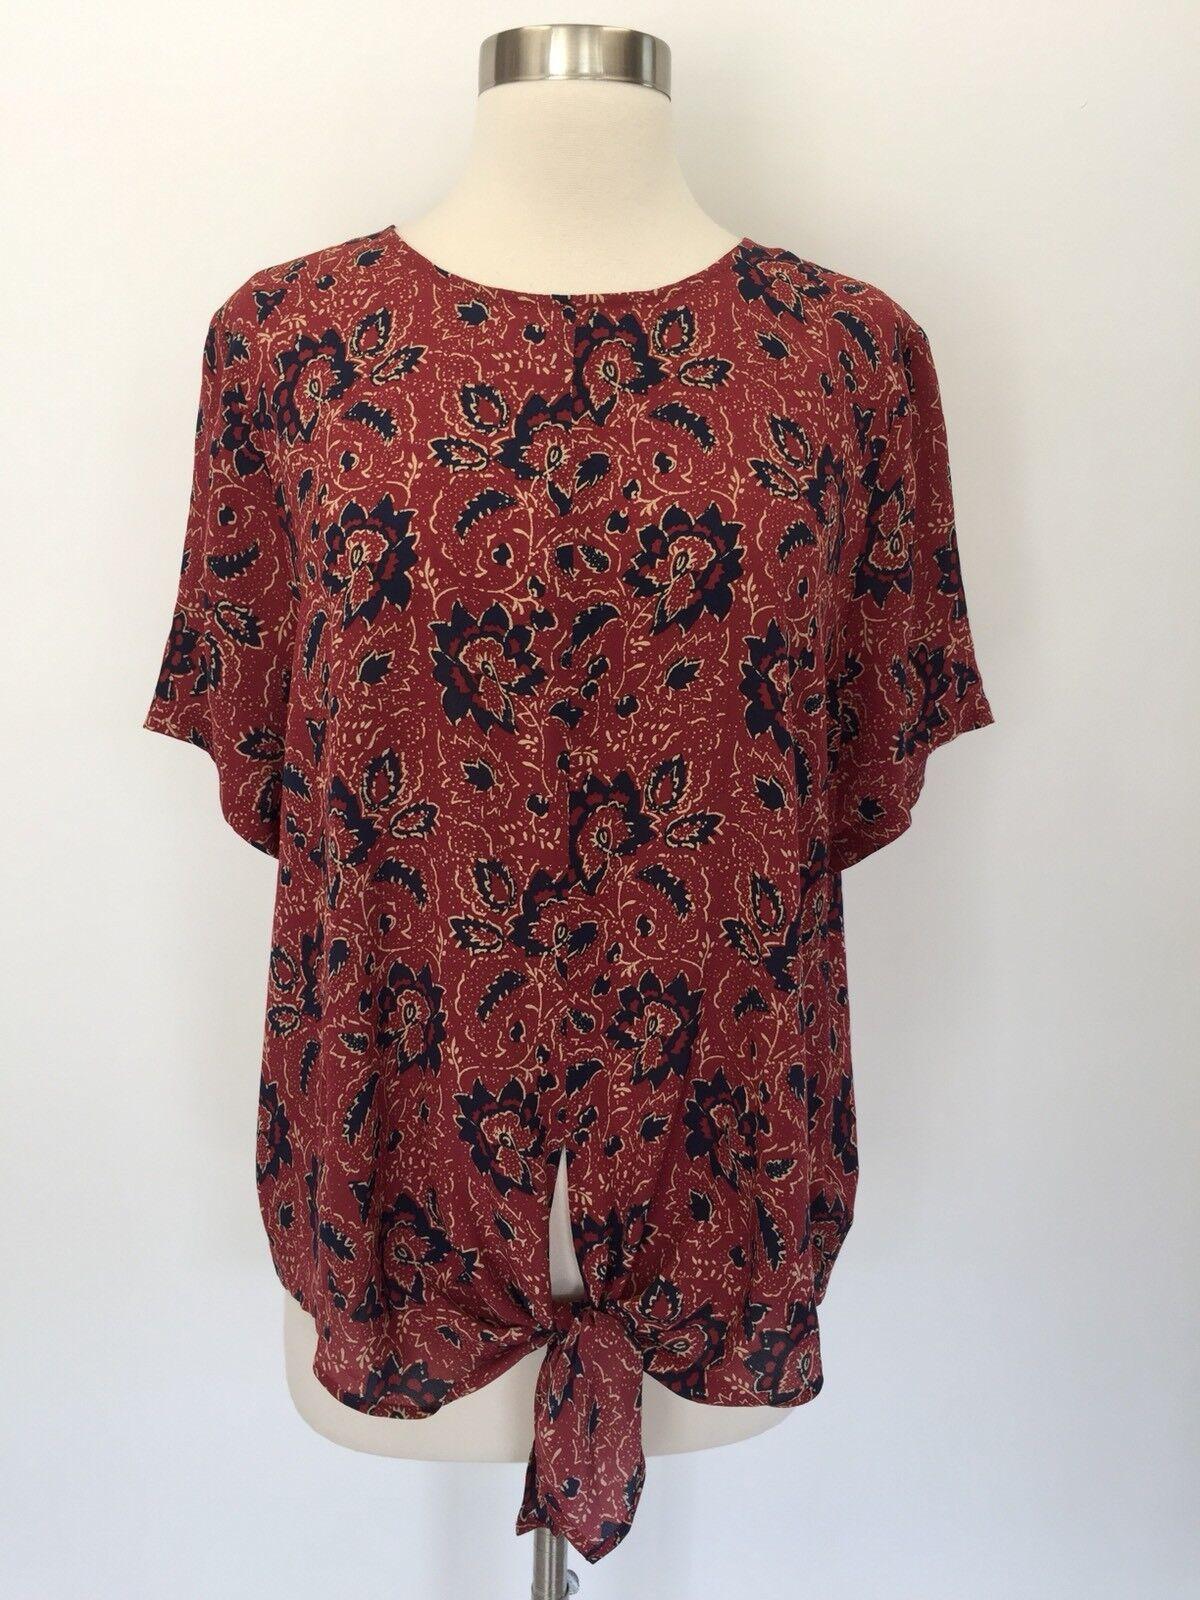 Madewell  silk button-back tie tee in assam floral Blouse Top Größe XL G2072